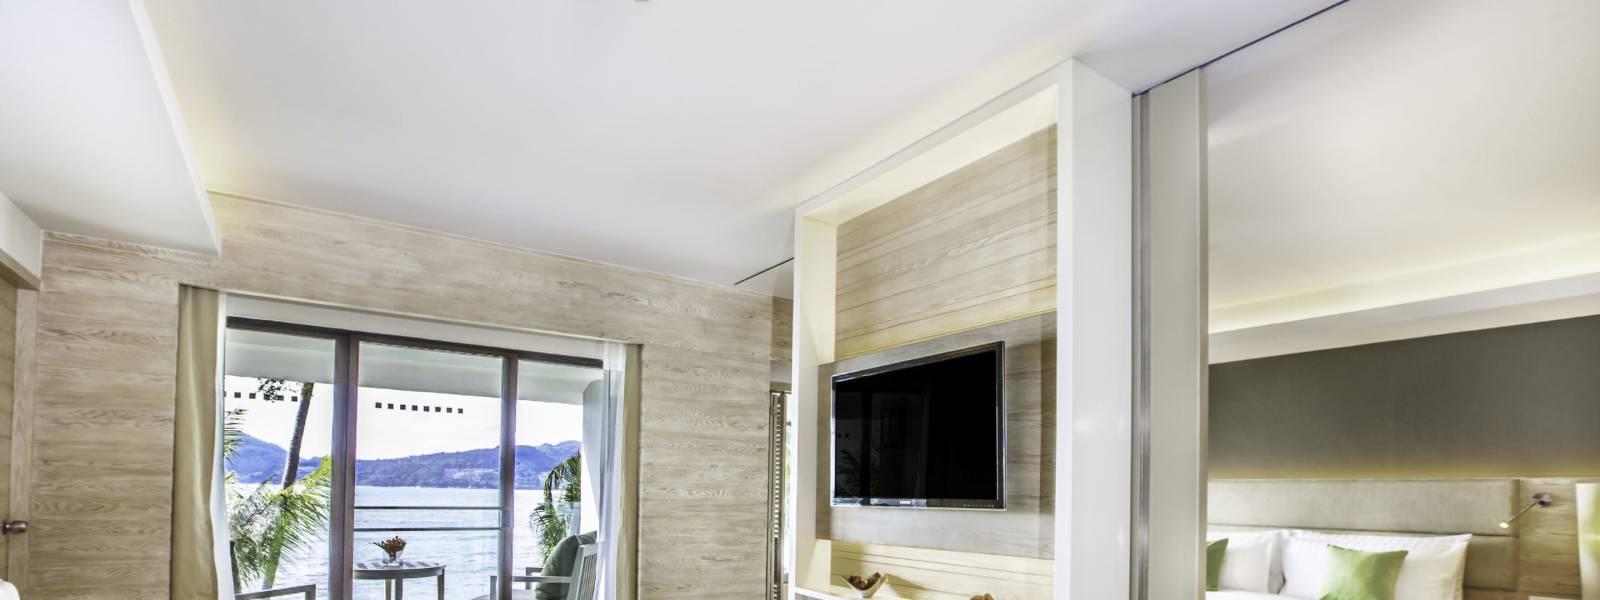 One bedroom Suite - Oceanfacing Room